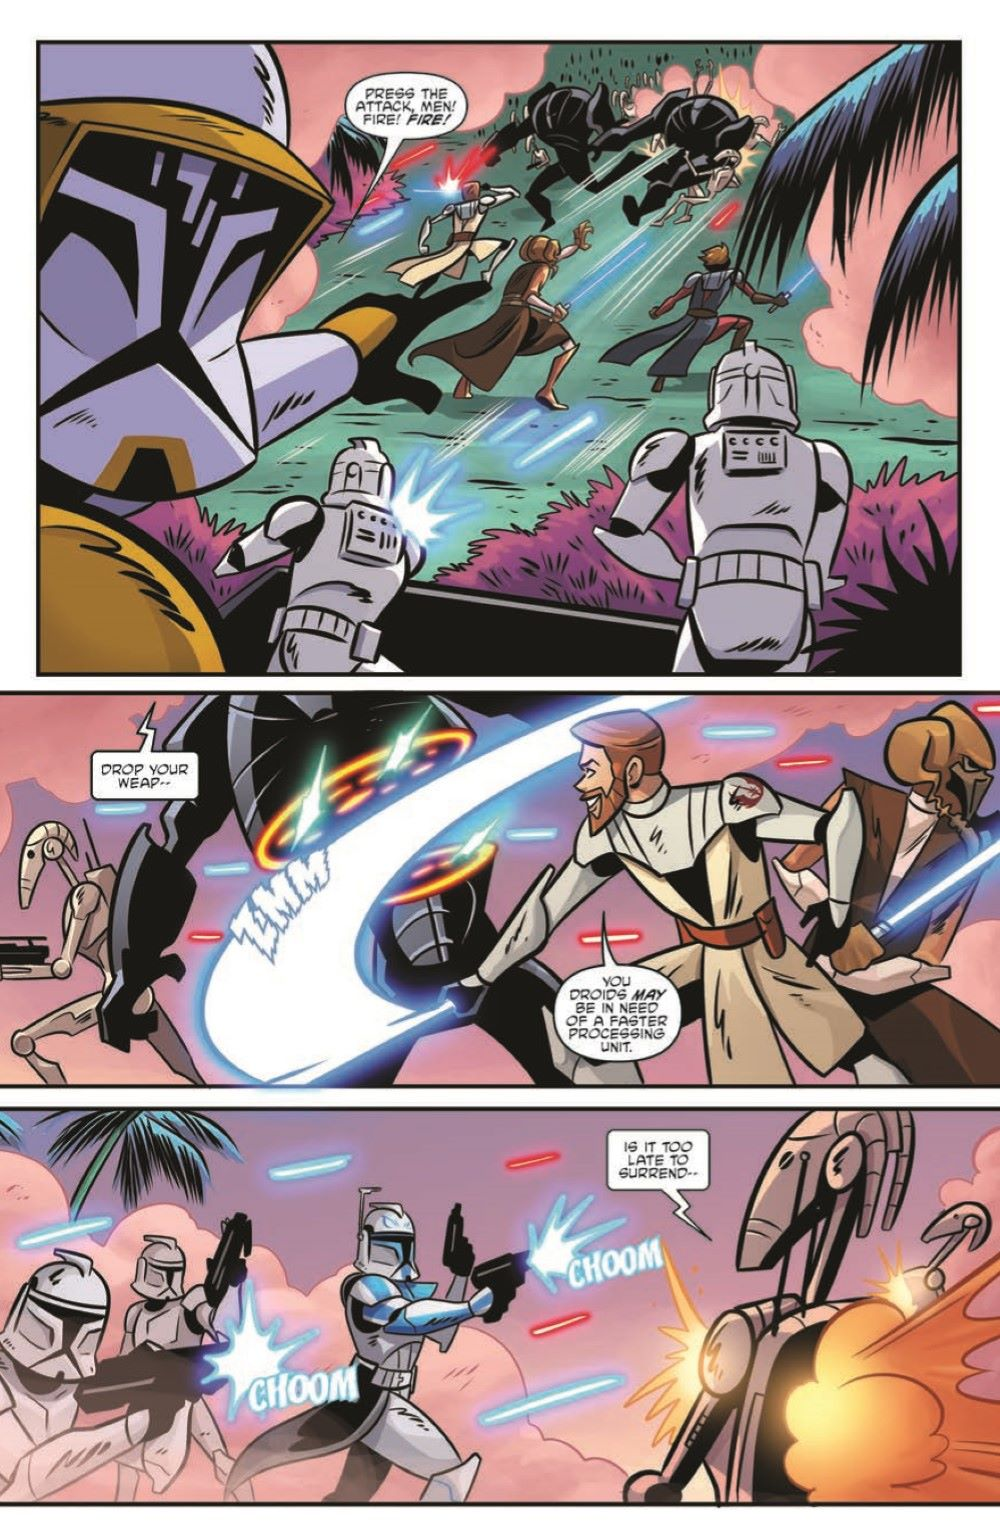 SWA_The-Clone-Wars_Battle-Tales_pr-7 ComicList Previews: STAR WARS ADVENTURES THE CLONE WARS BATTLE TALES GN